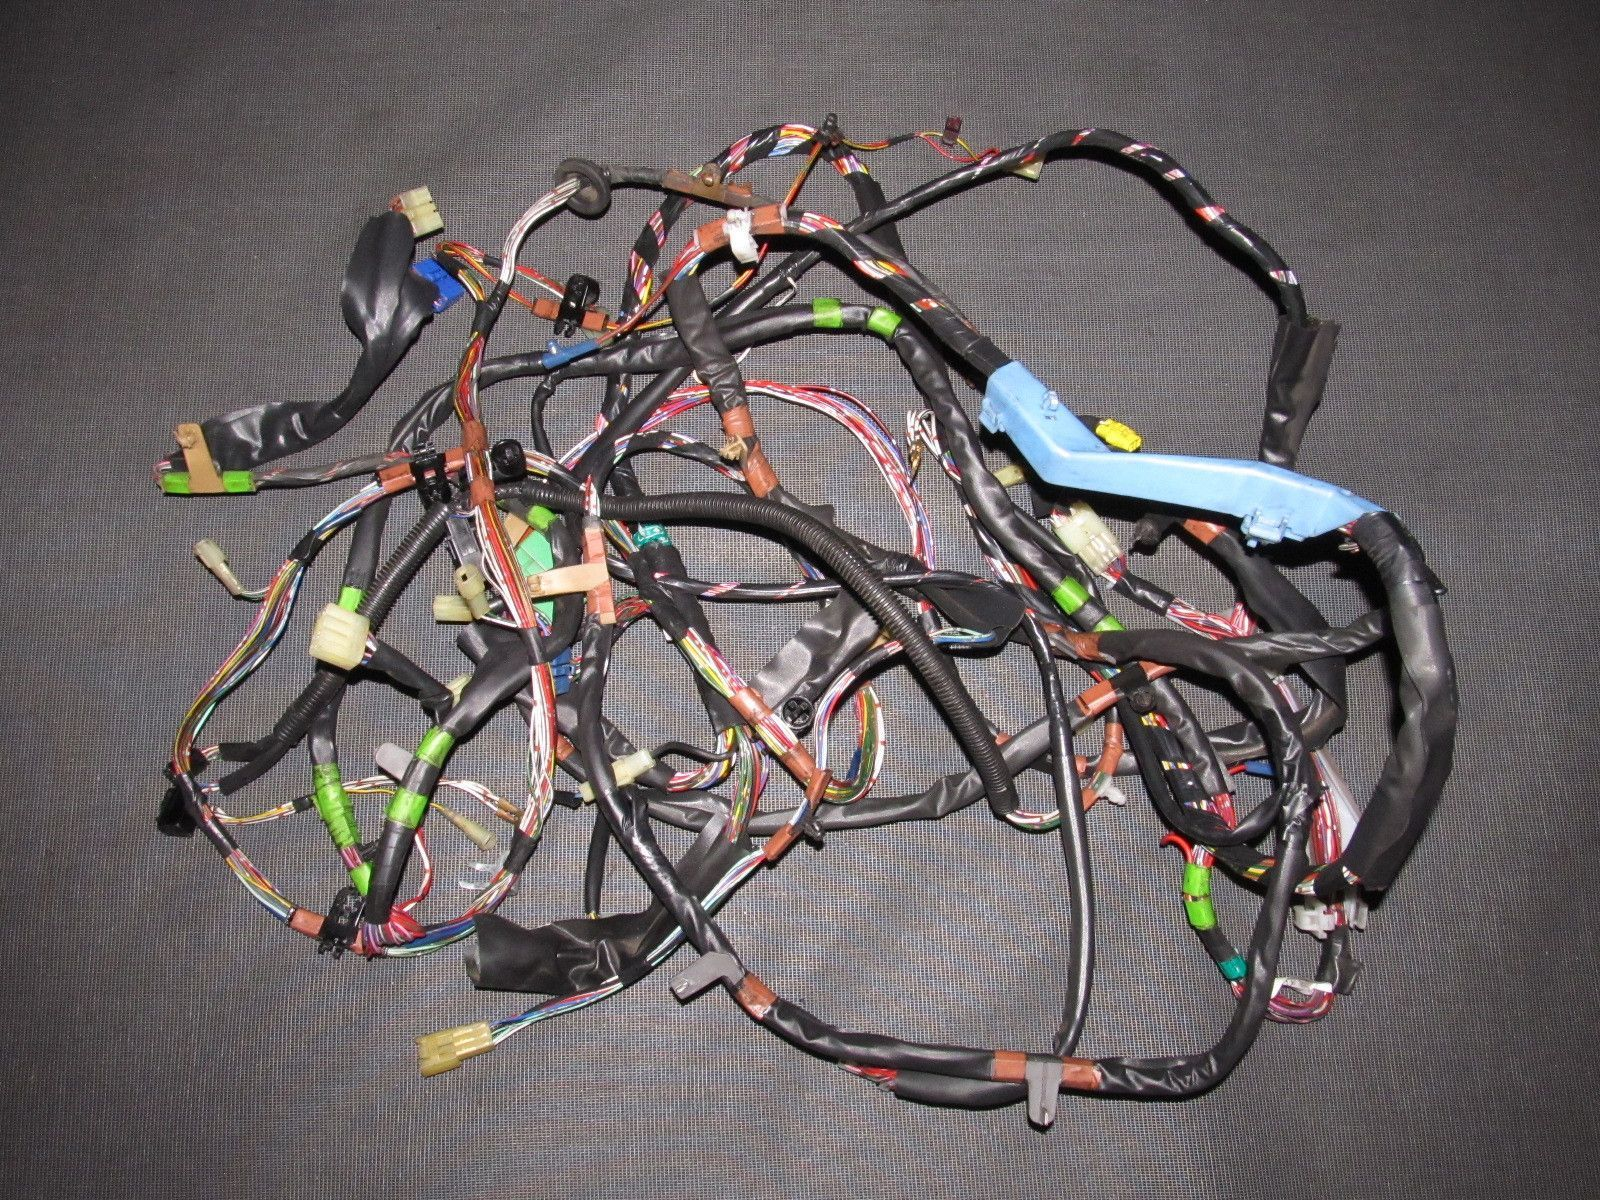 86 87 88 Toyota Supra Oem Tail Light Fuel Pump Wiring Harness Wire